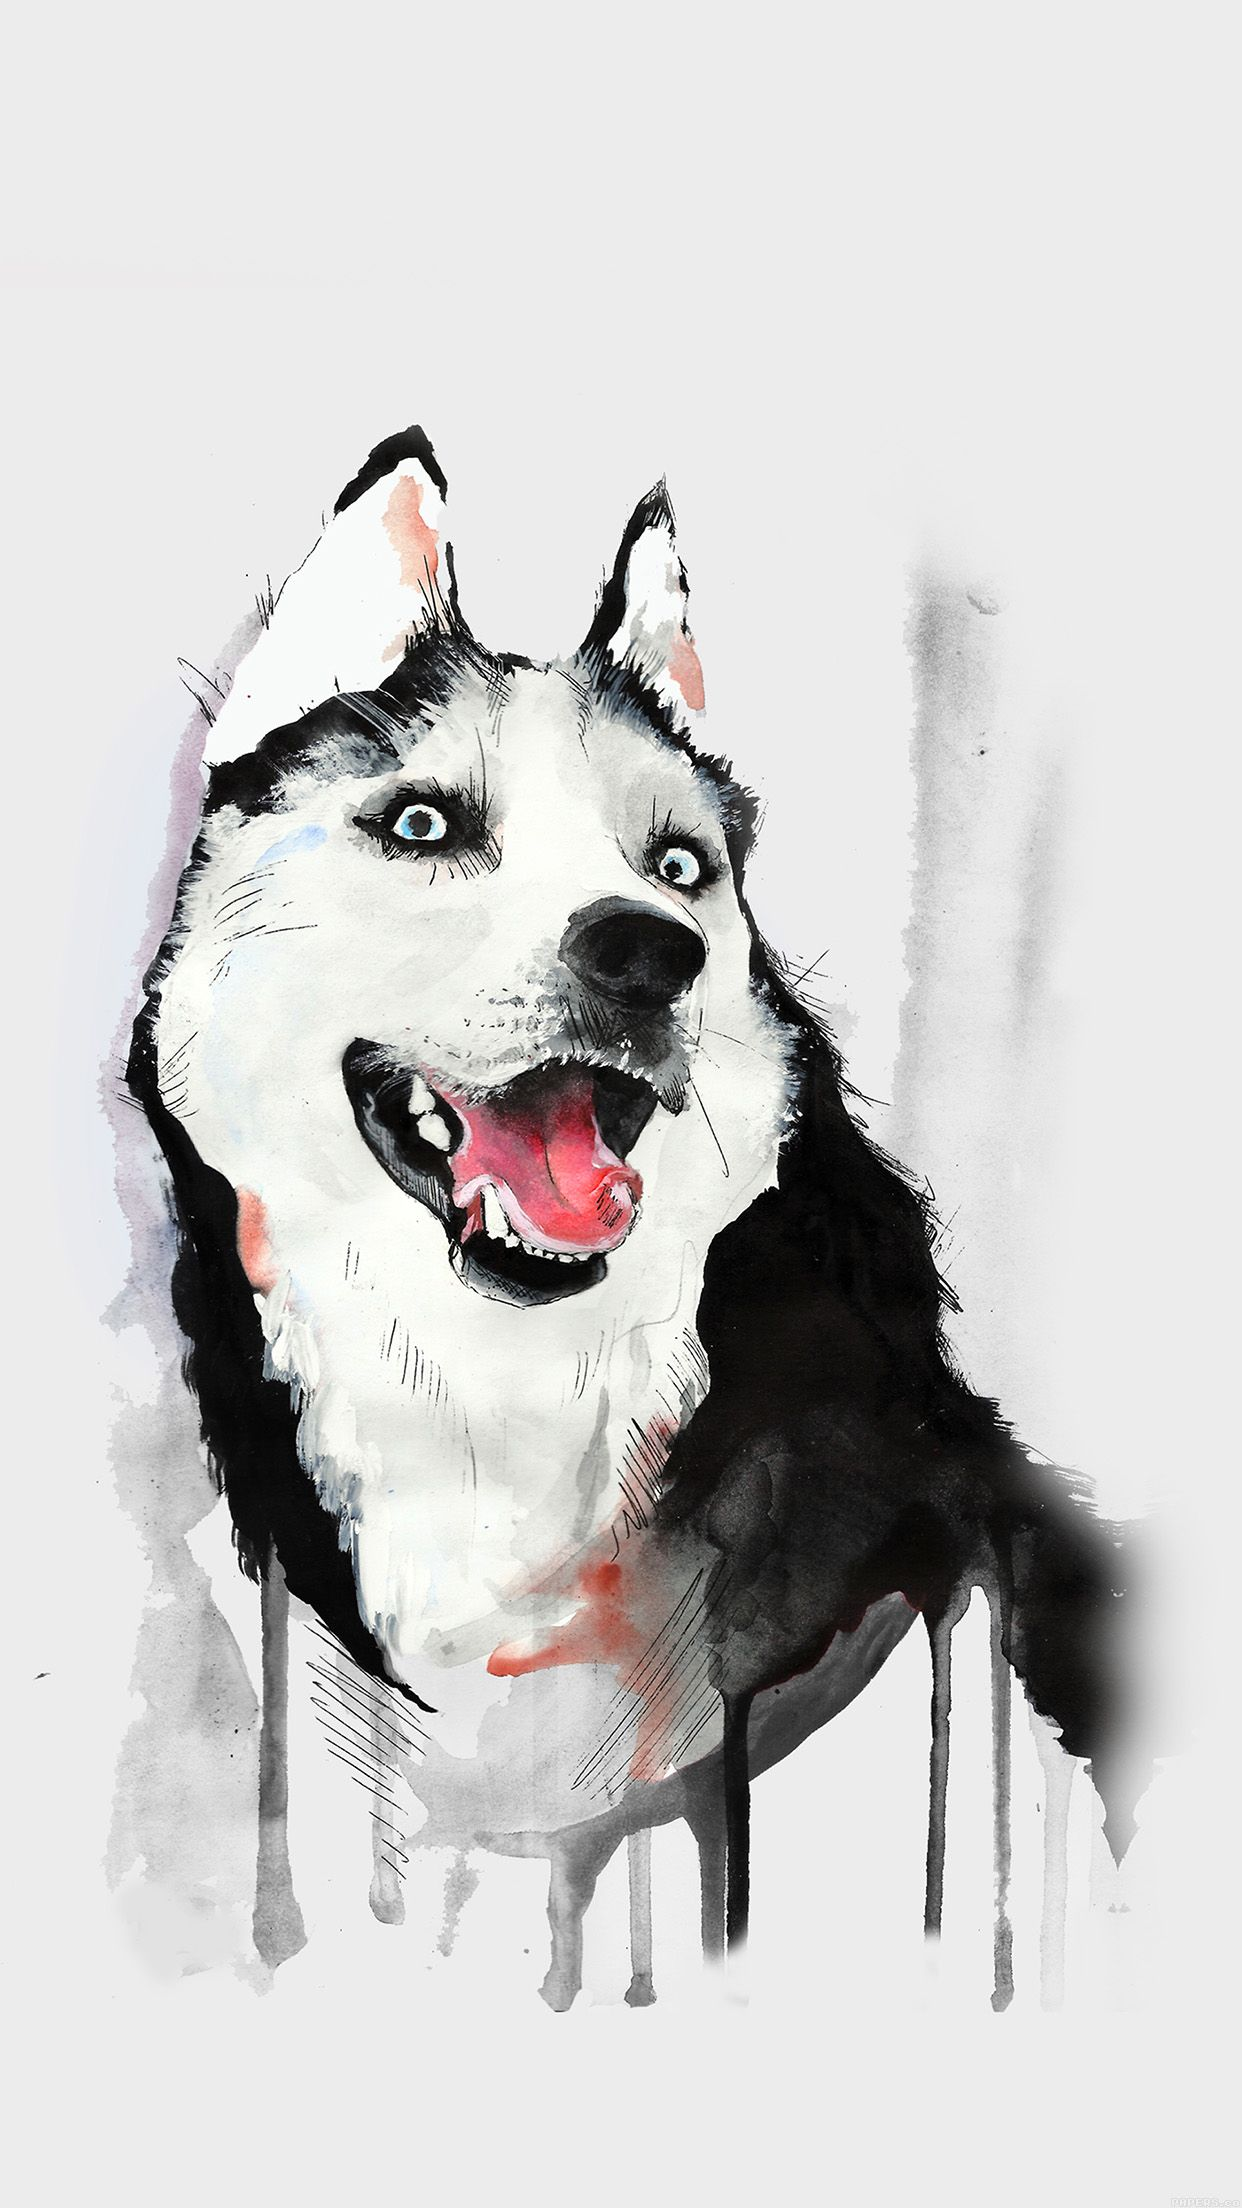 30 Amazing Illustrations iPhone Wallpapers Ipad wallpaper 1242x2208